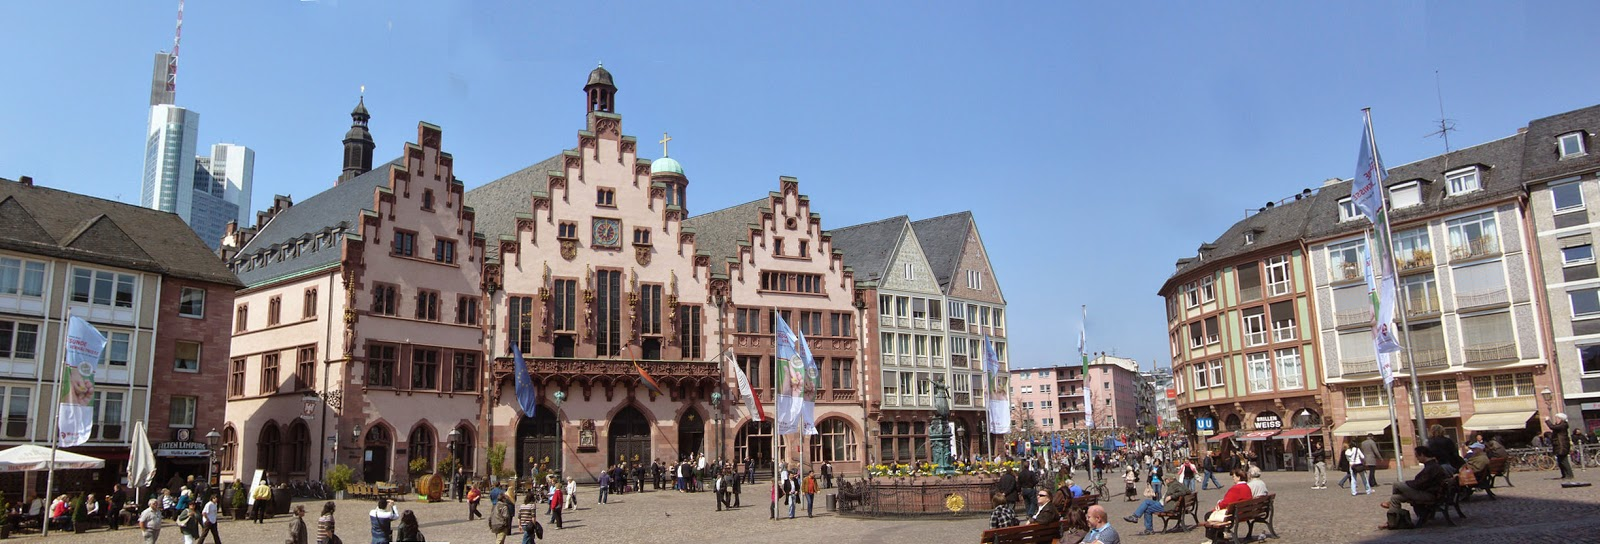 Dicas rápidas sobre Frankfurt